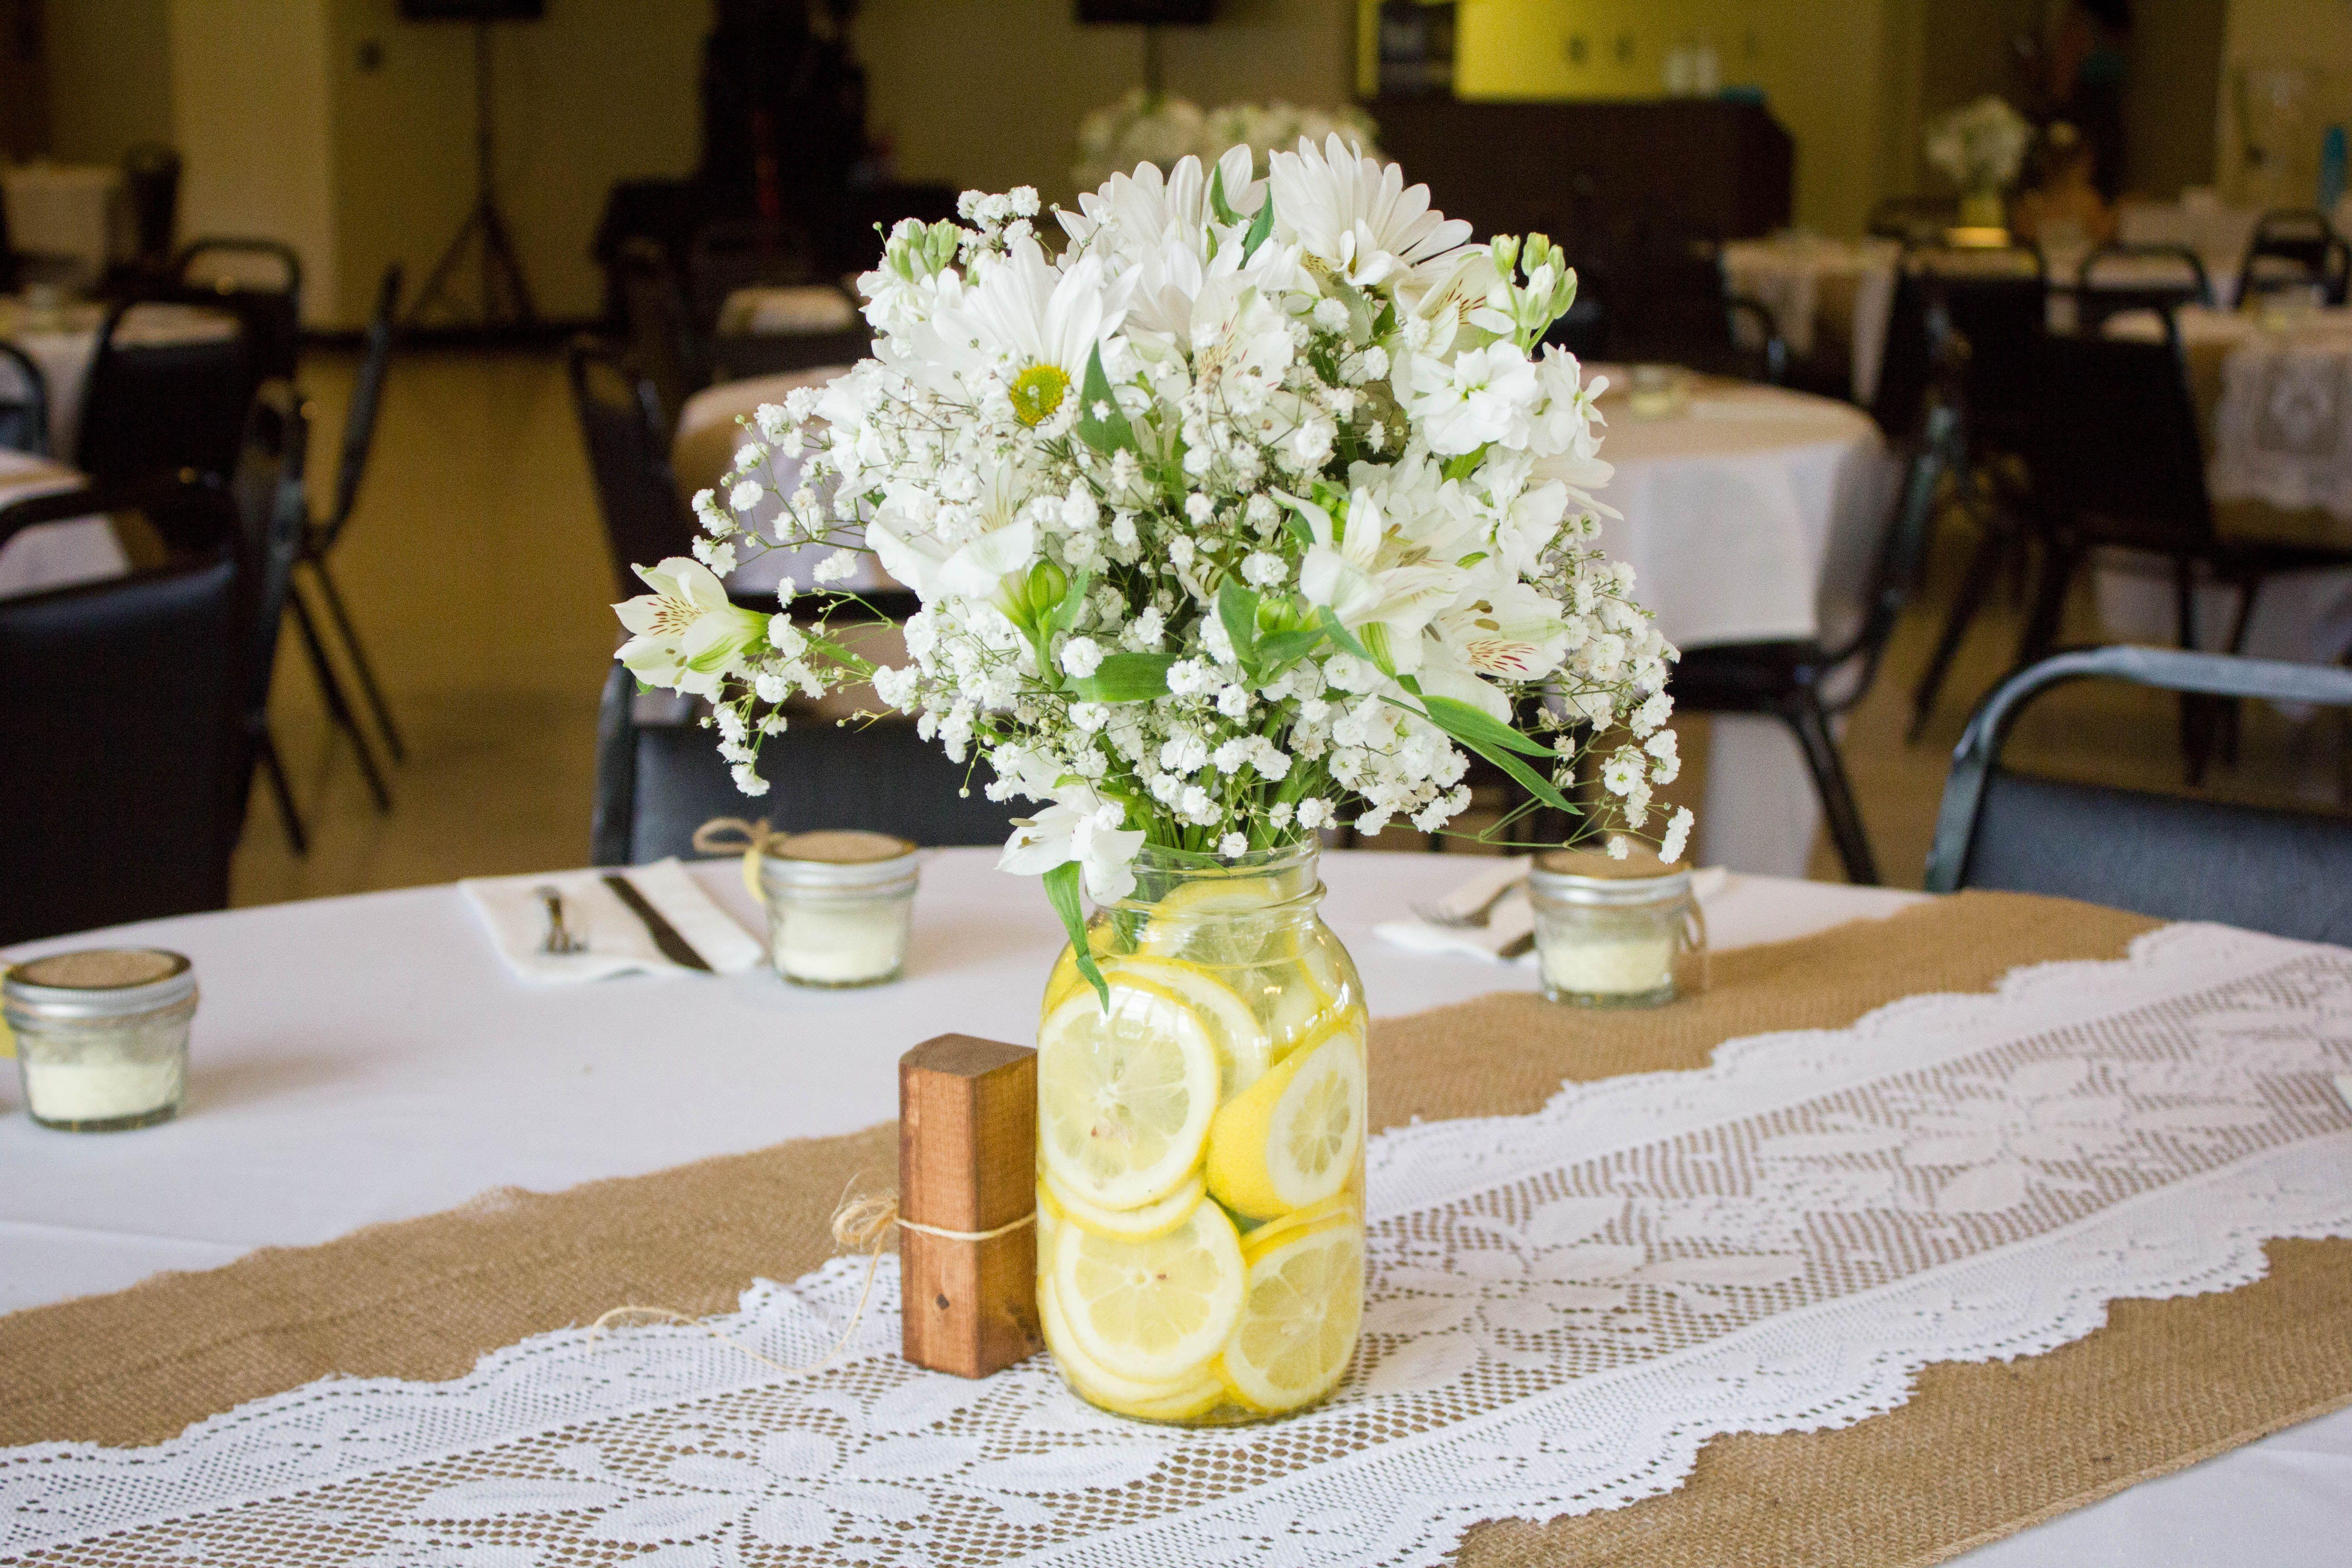 rustic country wedding burlap lace runner lemon ... - photo#46